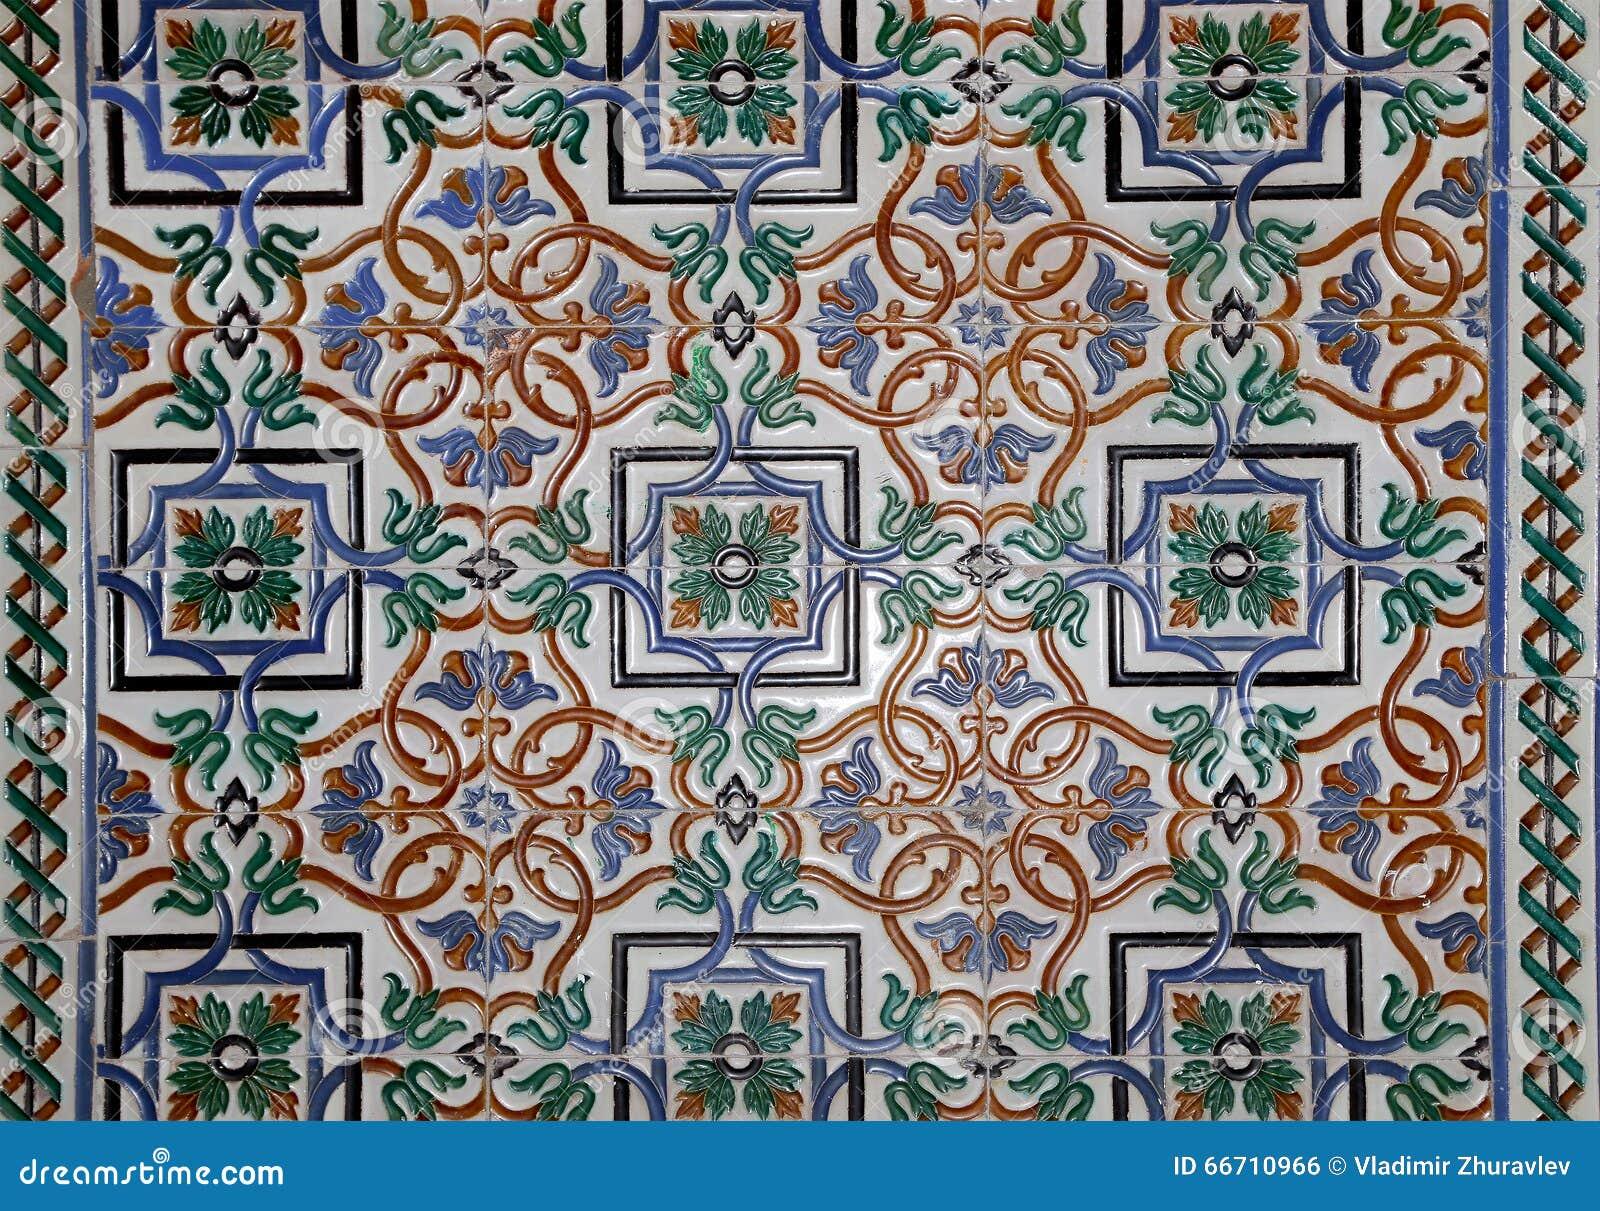 Set Of Traditional Islamic (Moorish) Ceramic Tiles, Plaza De Espana ...